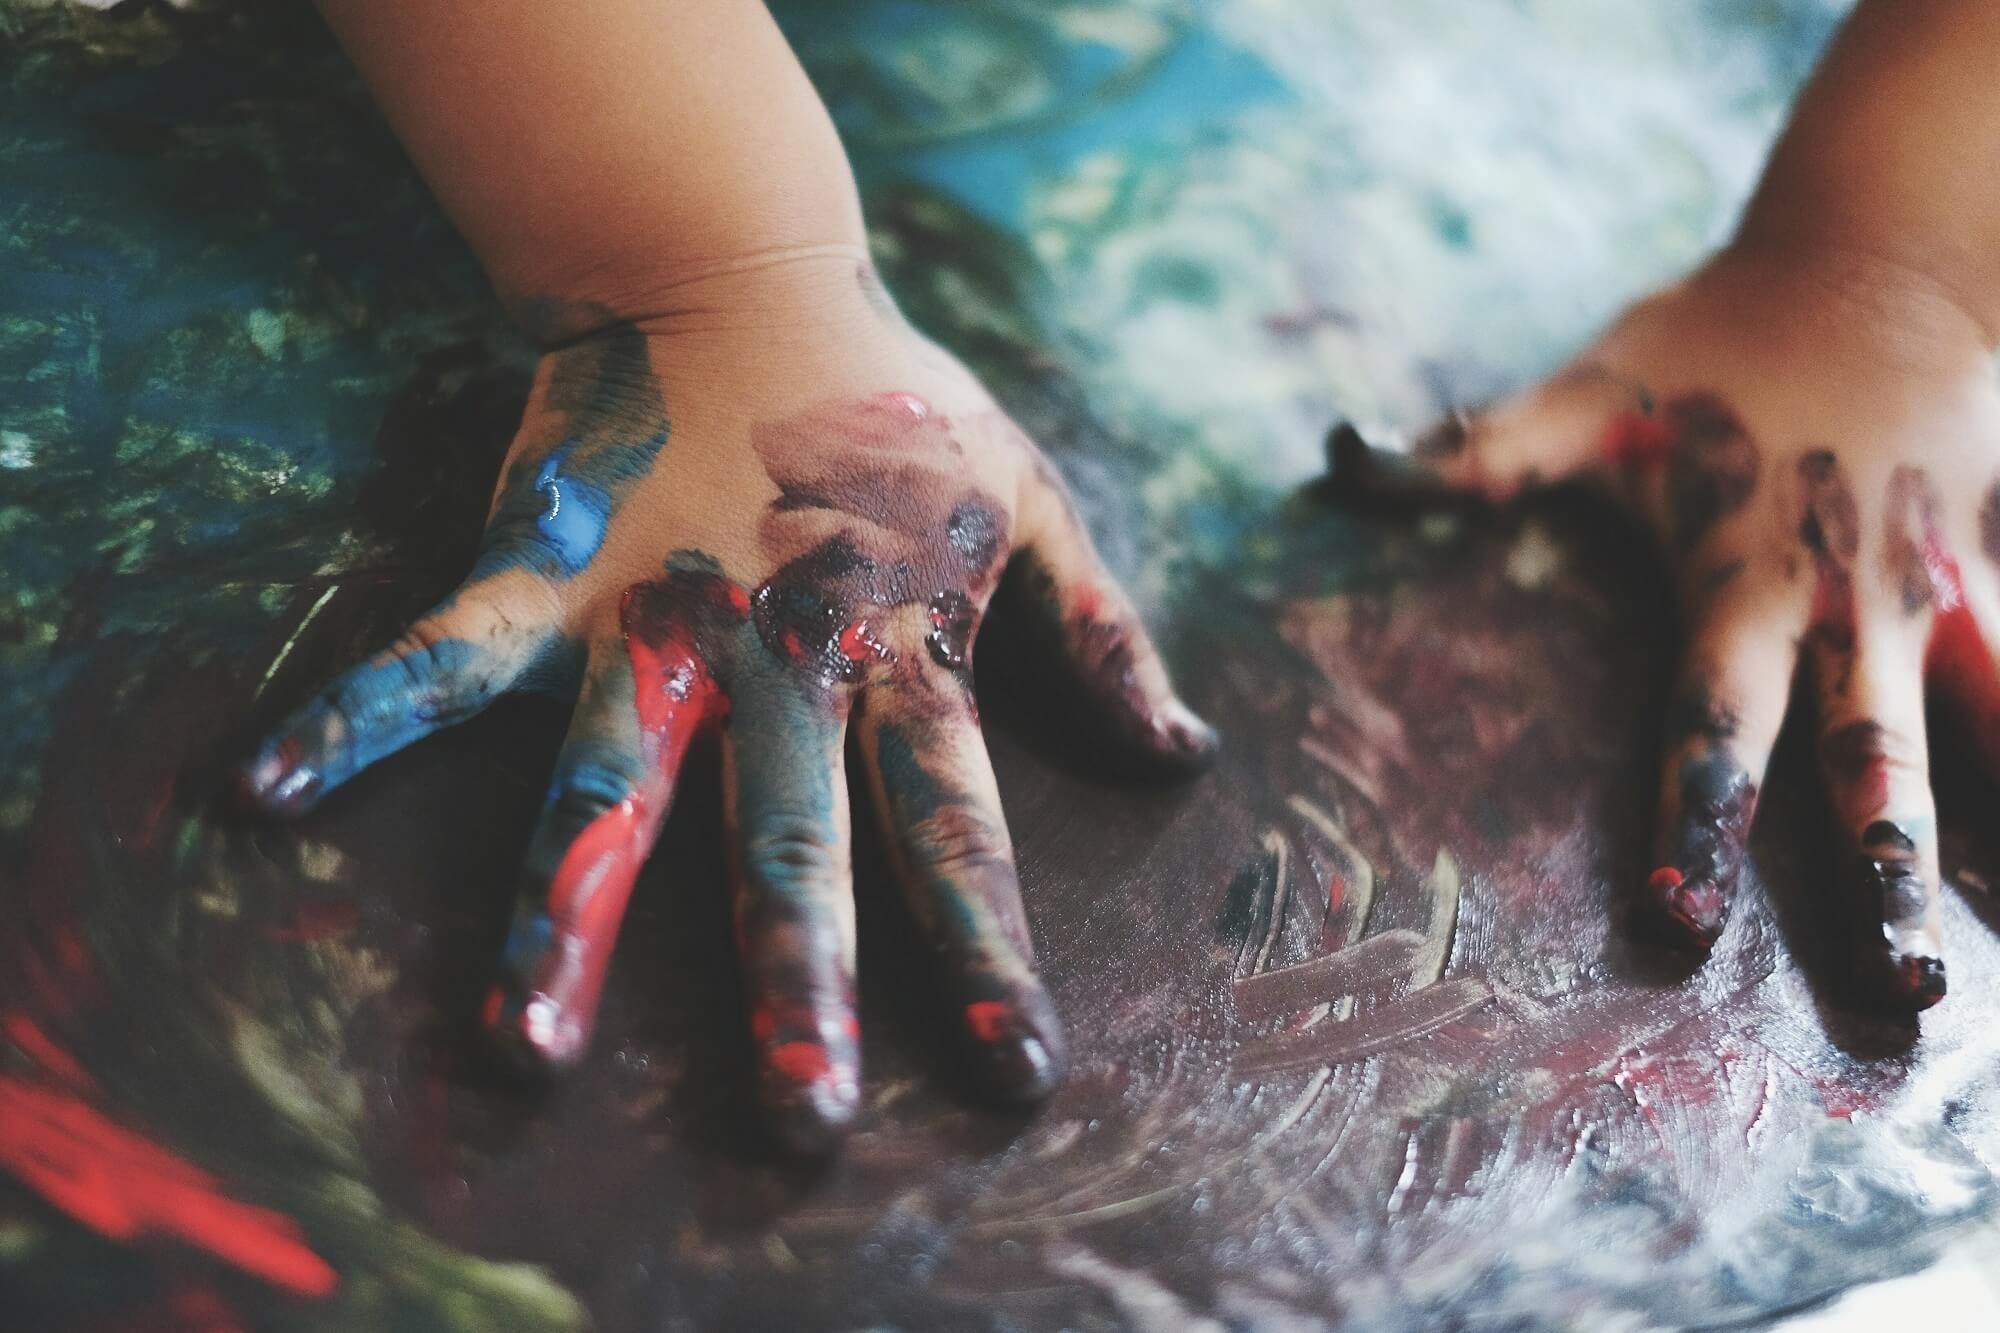 Impulsivity in Bipolar Disorder, Borderline Personality Disorder, ADHD